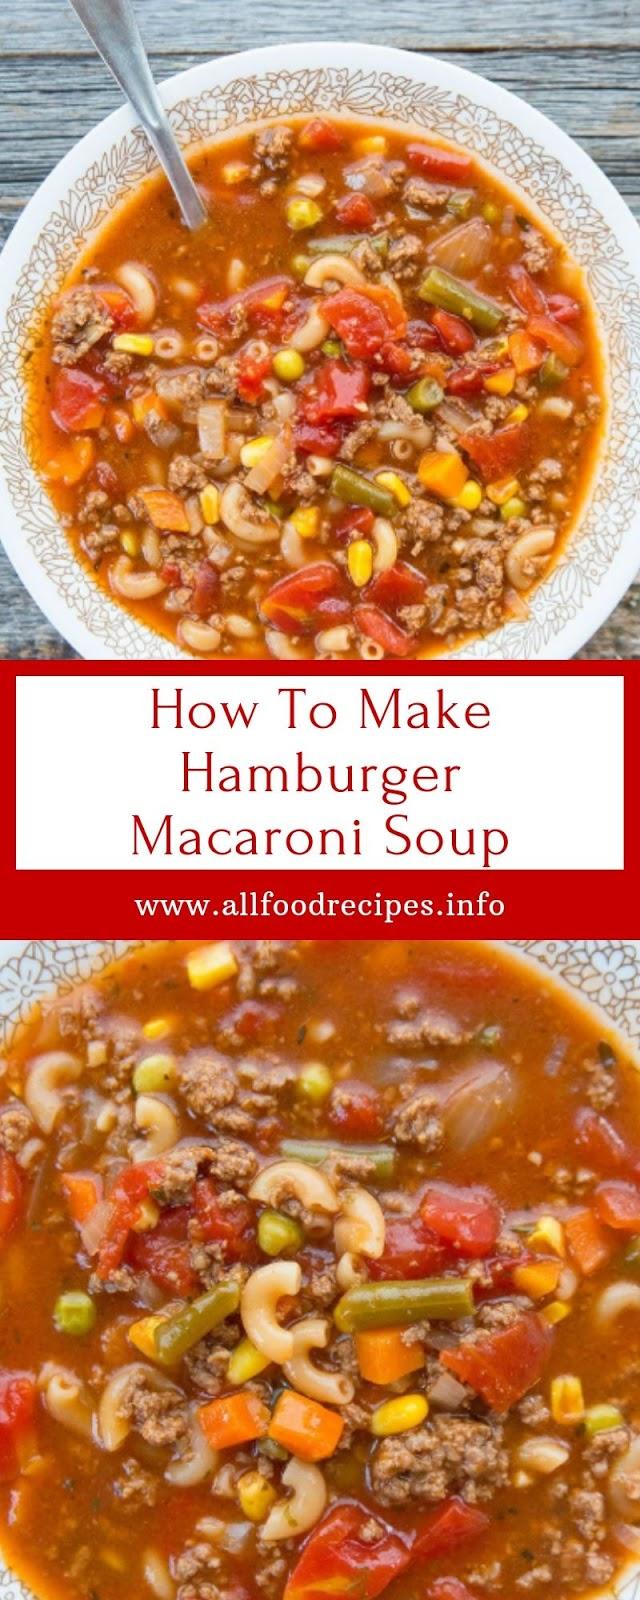 How To Make Hamburger Macaroni Soup